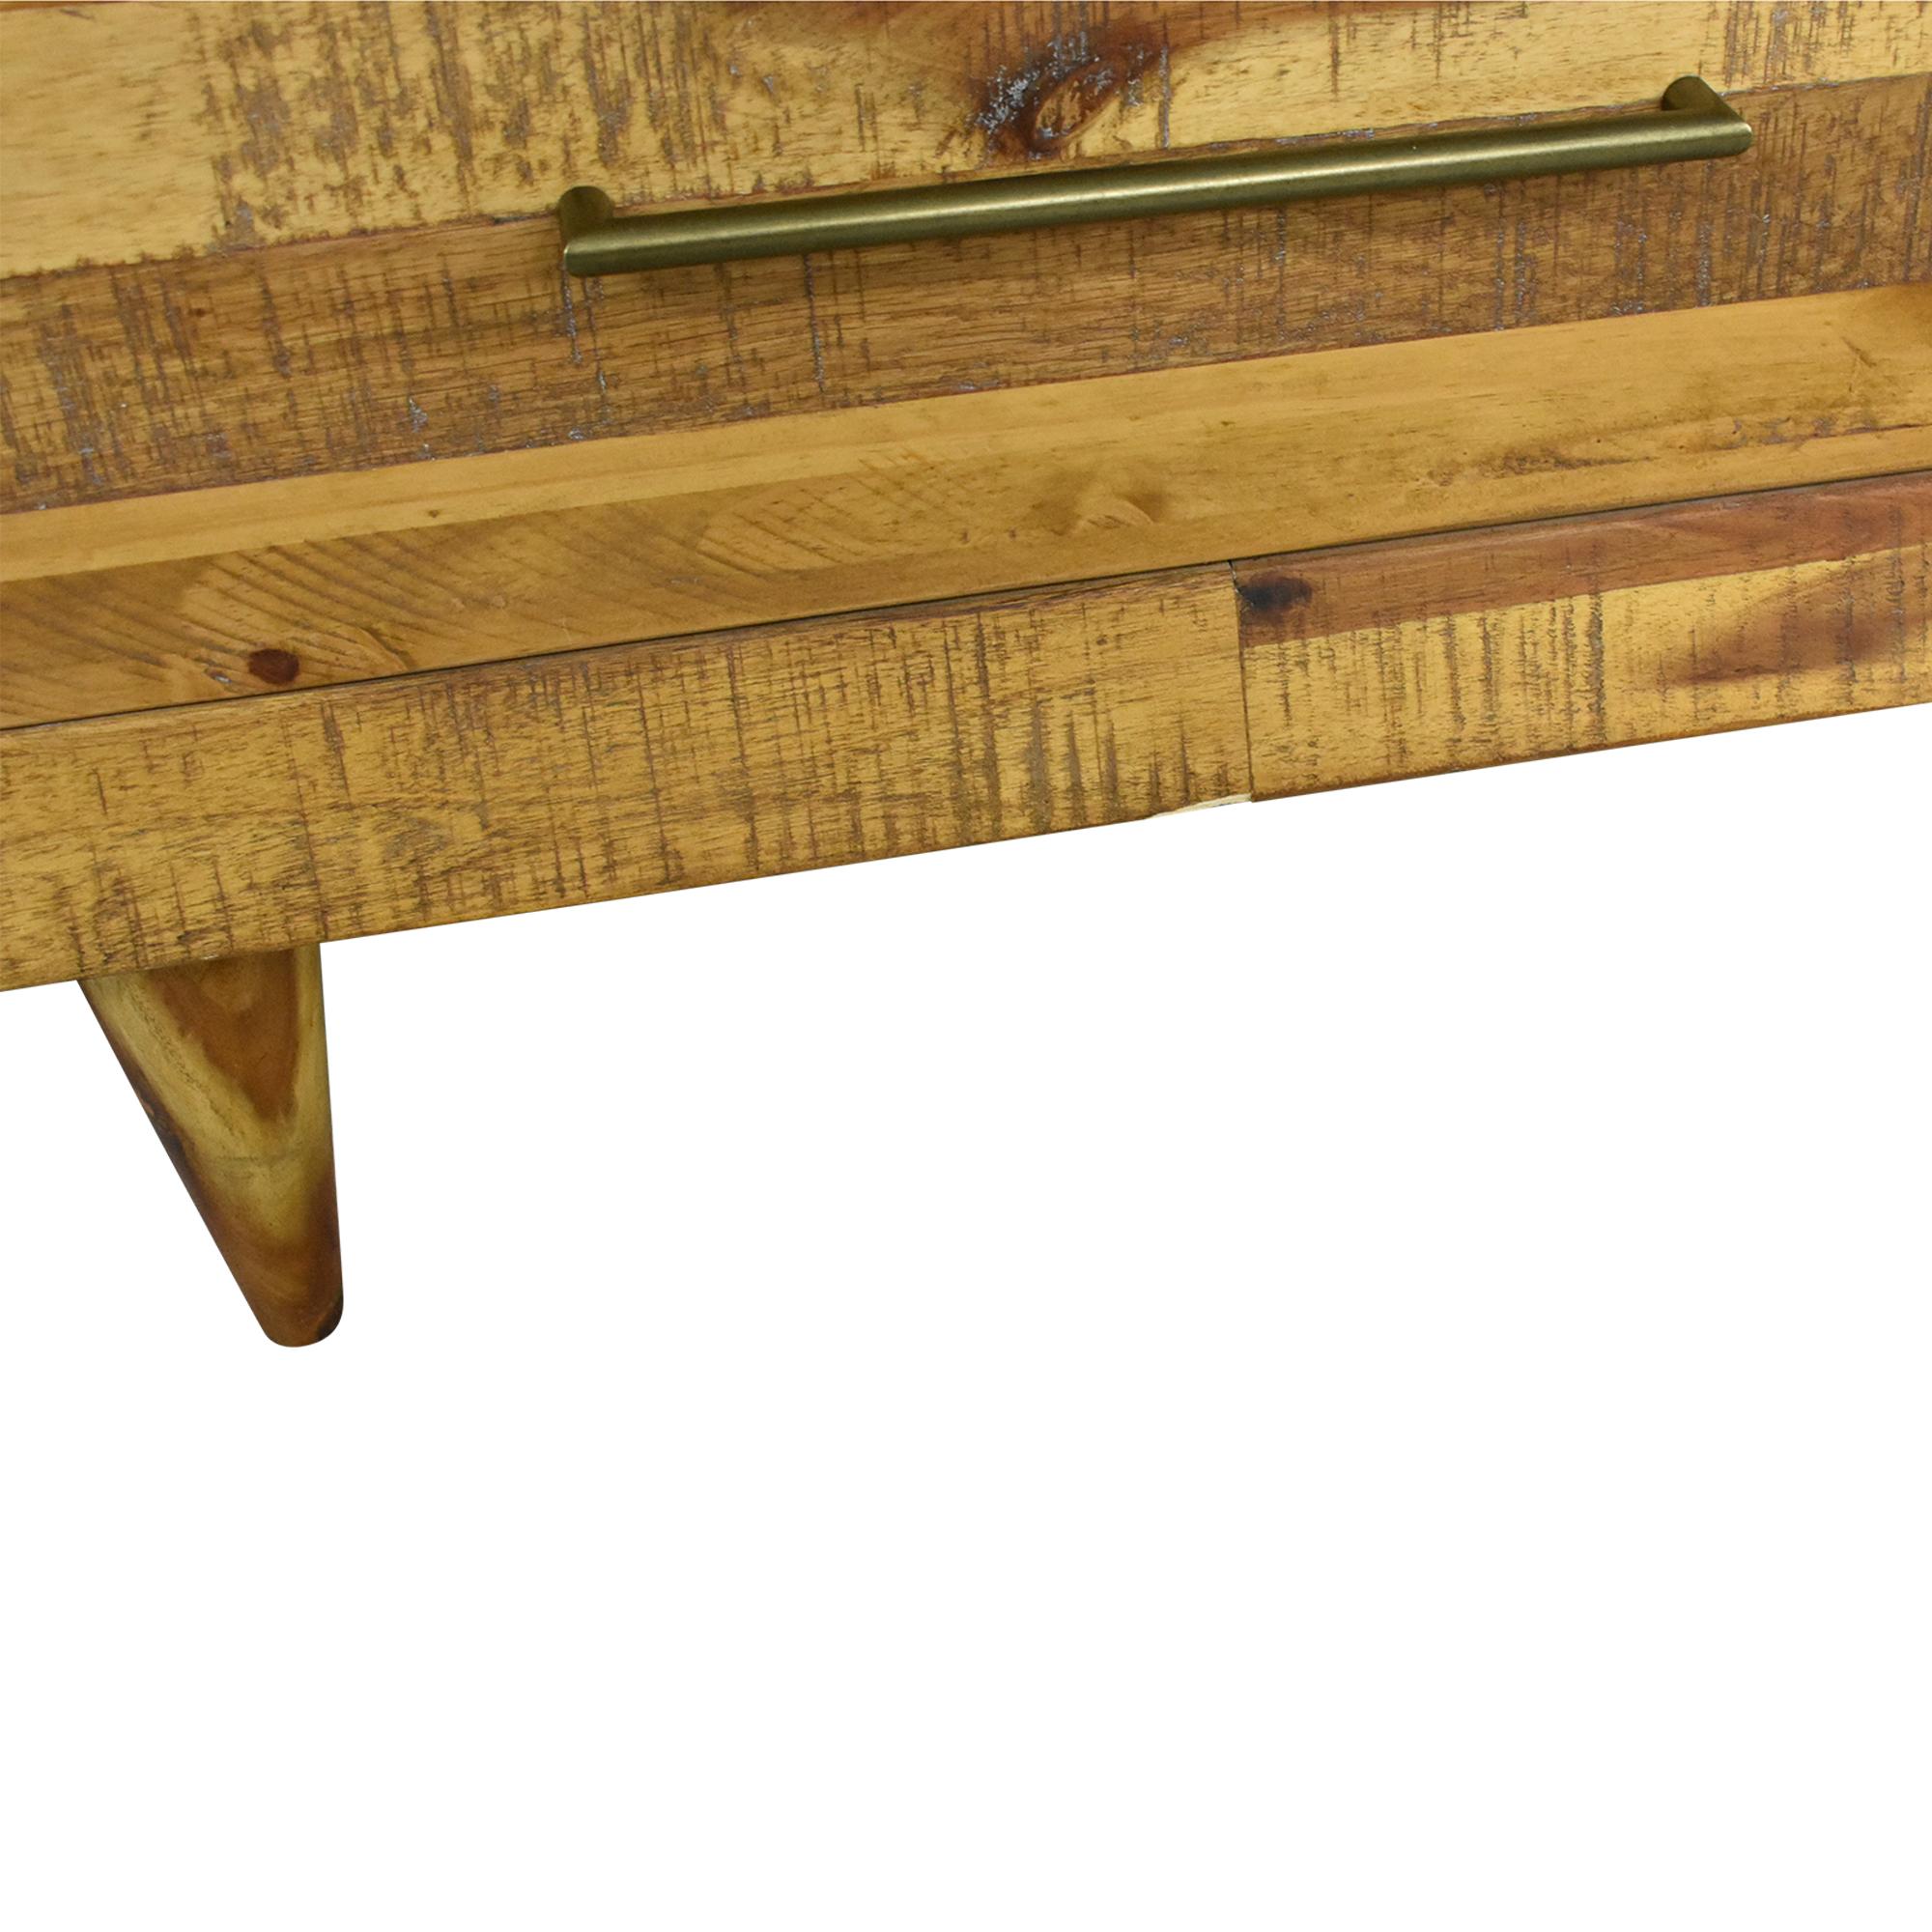 West Elm Alexa Reclaimed Seven Drawer Dresser / Dressers